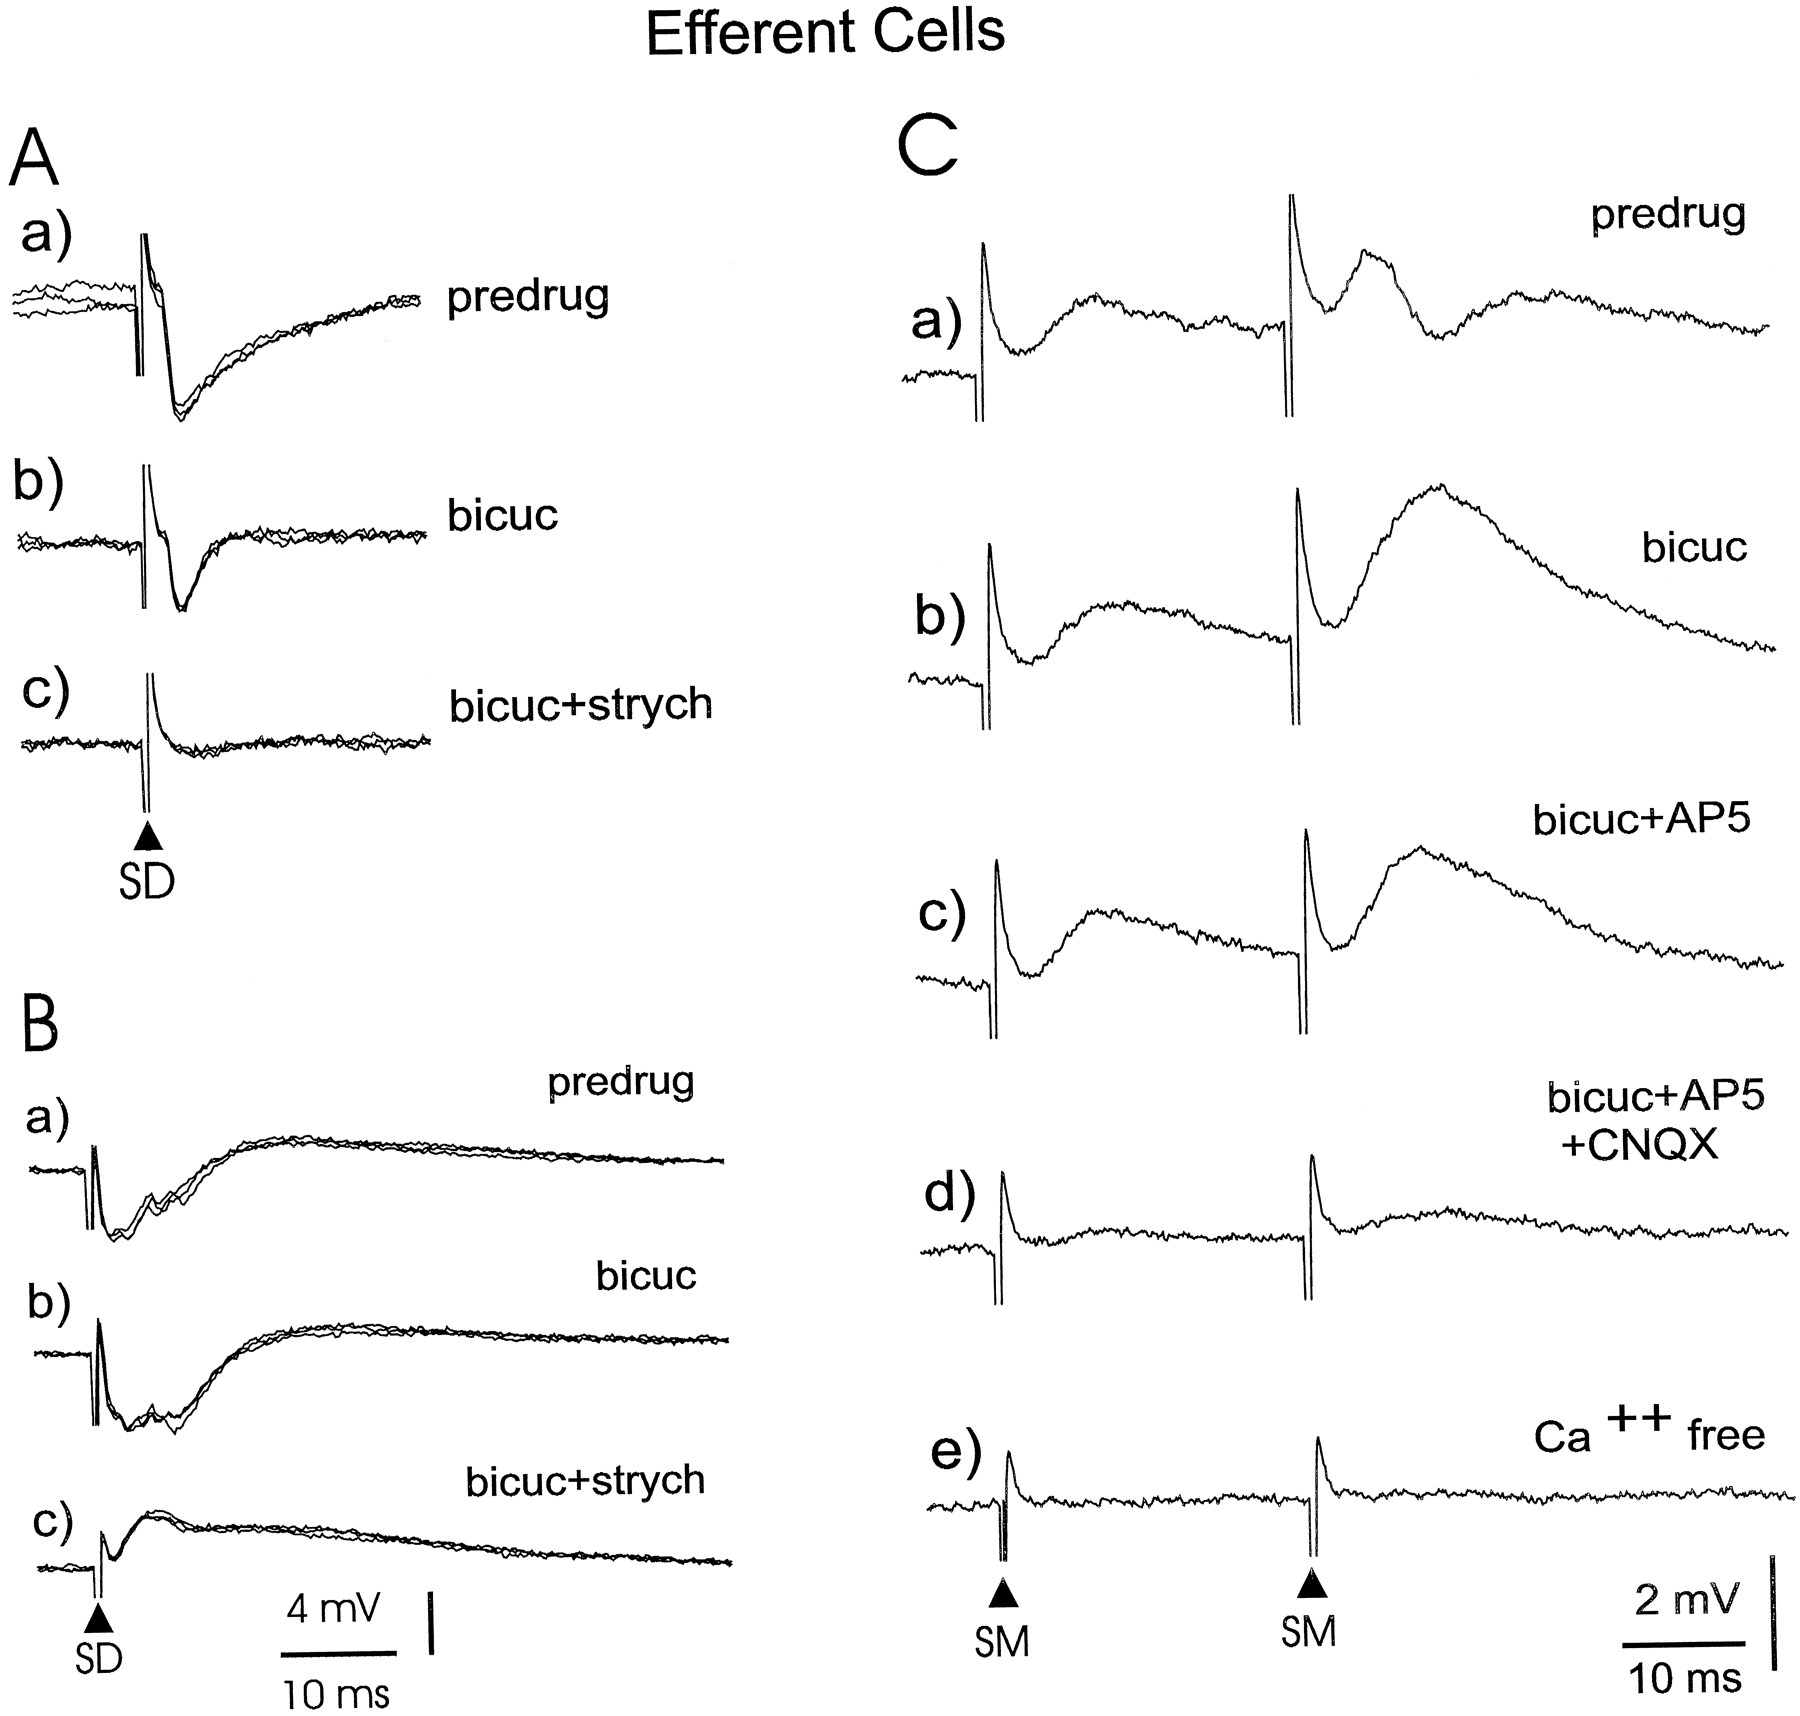 The Mormyrid Electrosensory Lobe In Vitro: Physiology and ...